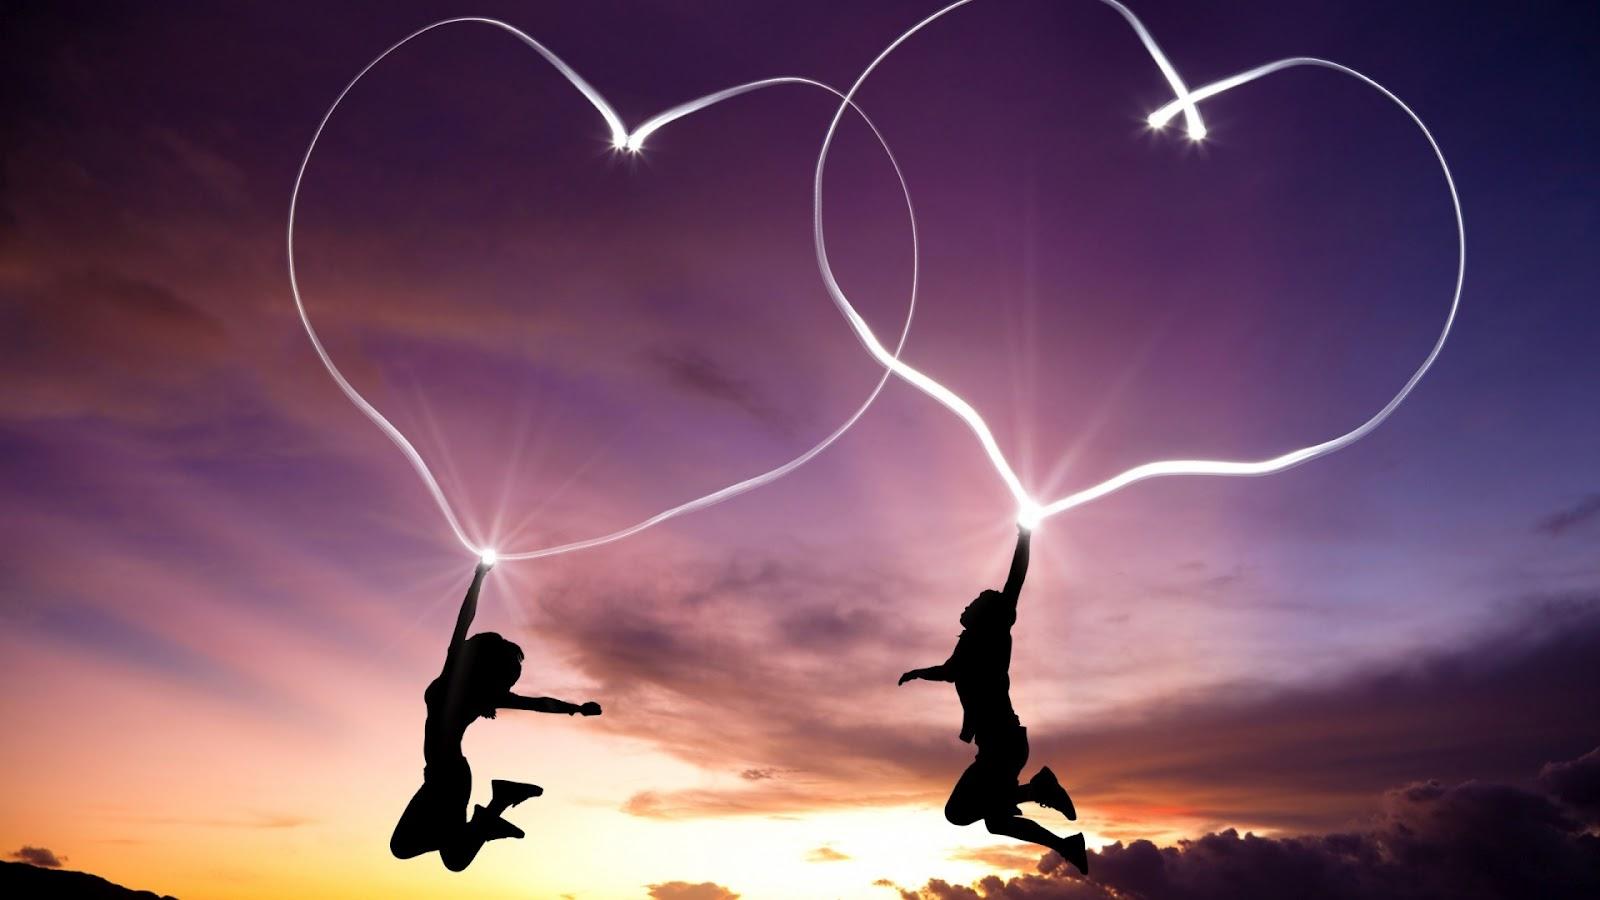 http://3.bp.blogspot.com/-LwqdoYJoZp4/UBXcN0aSlBI/AAAAAAAAE2I/CoFAClavX90/s1600/Romantic_Wallpaper4.jpg